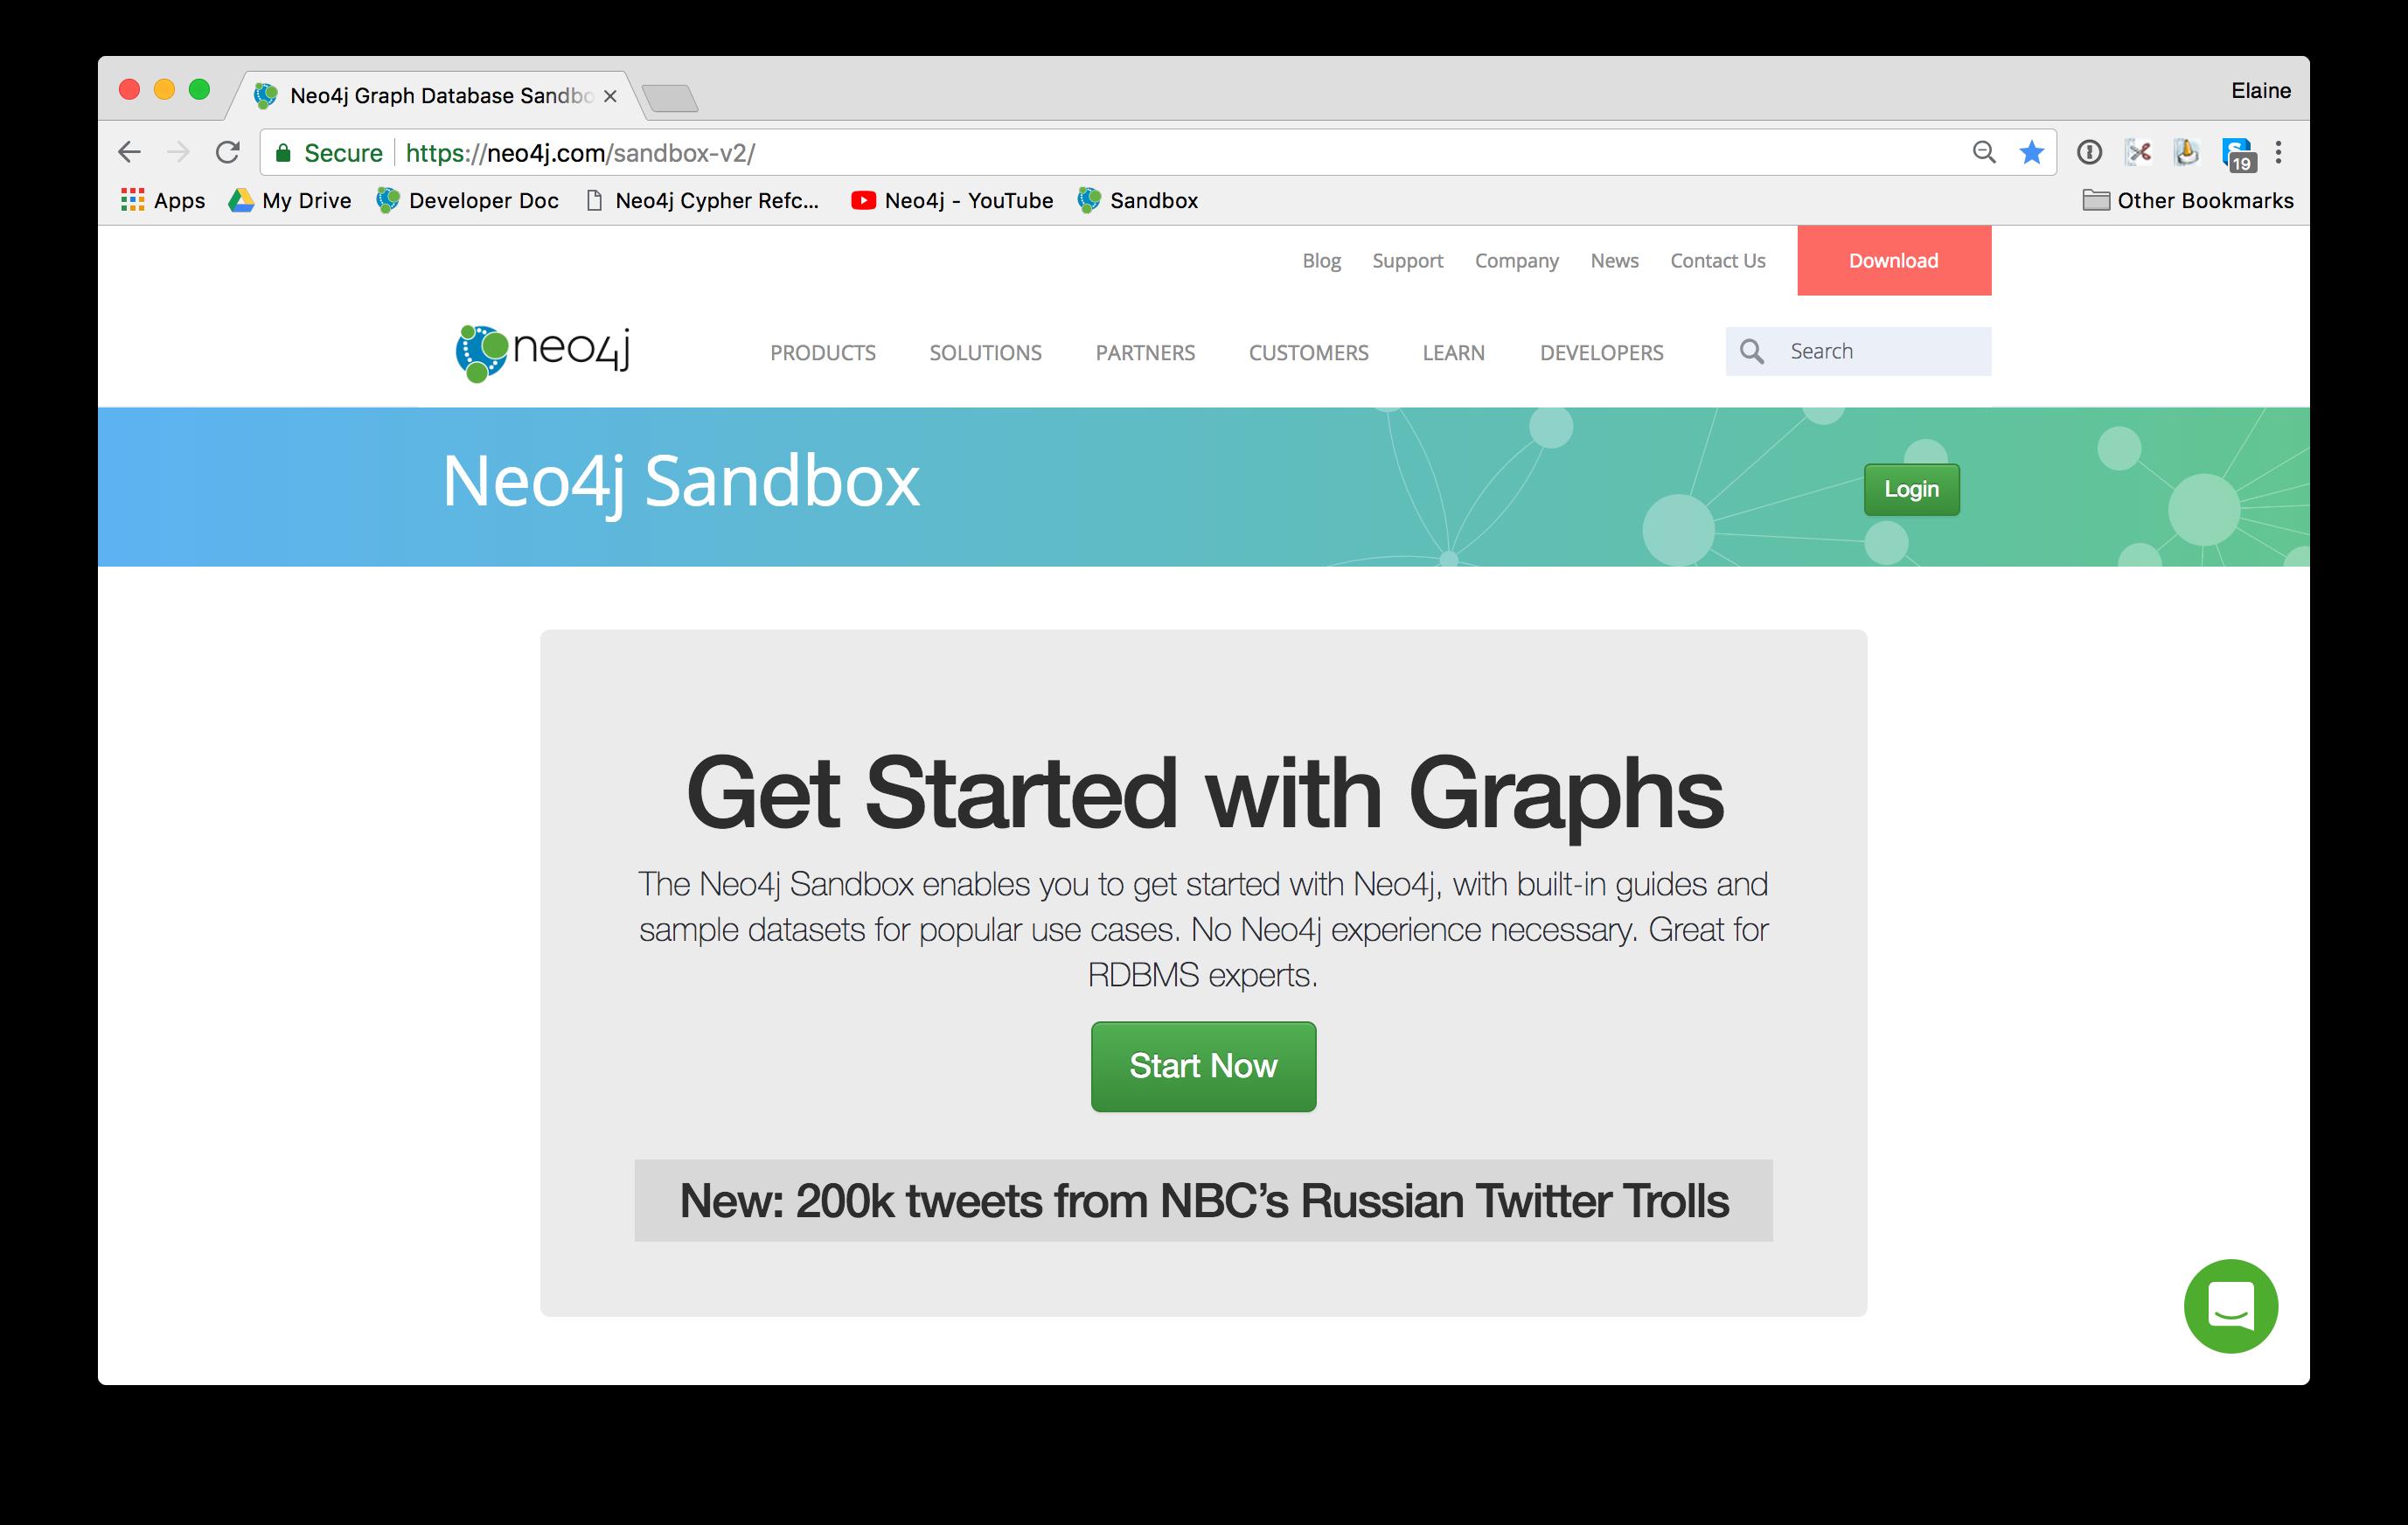 Neo4jSandbox